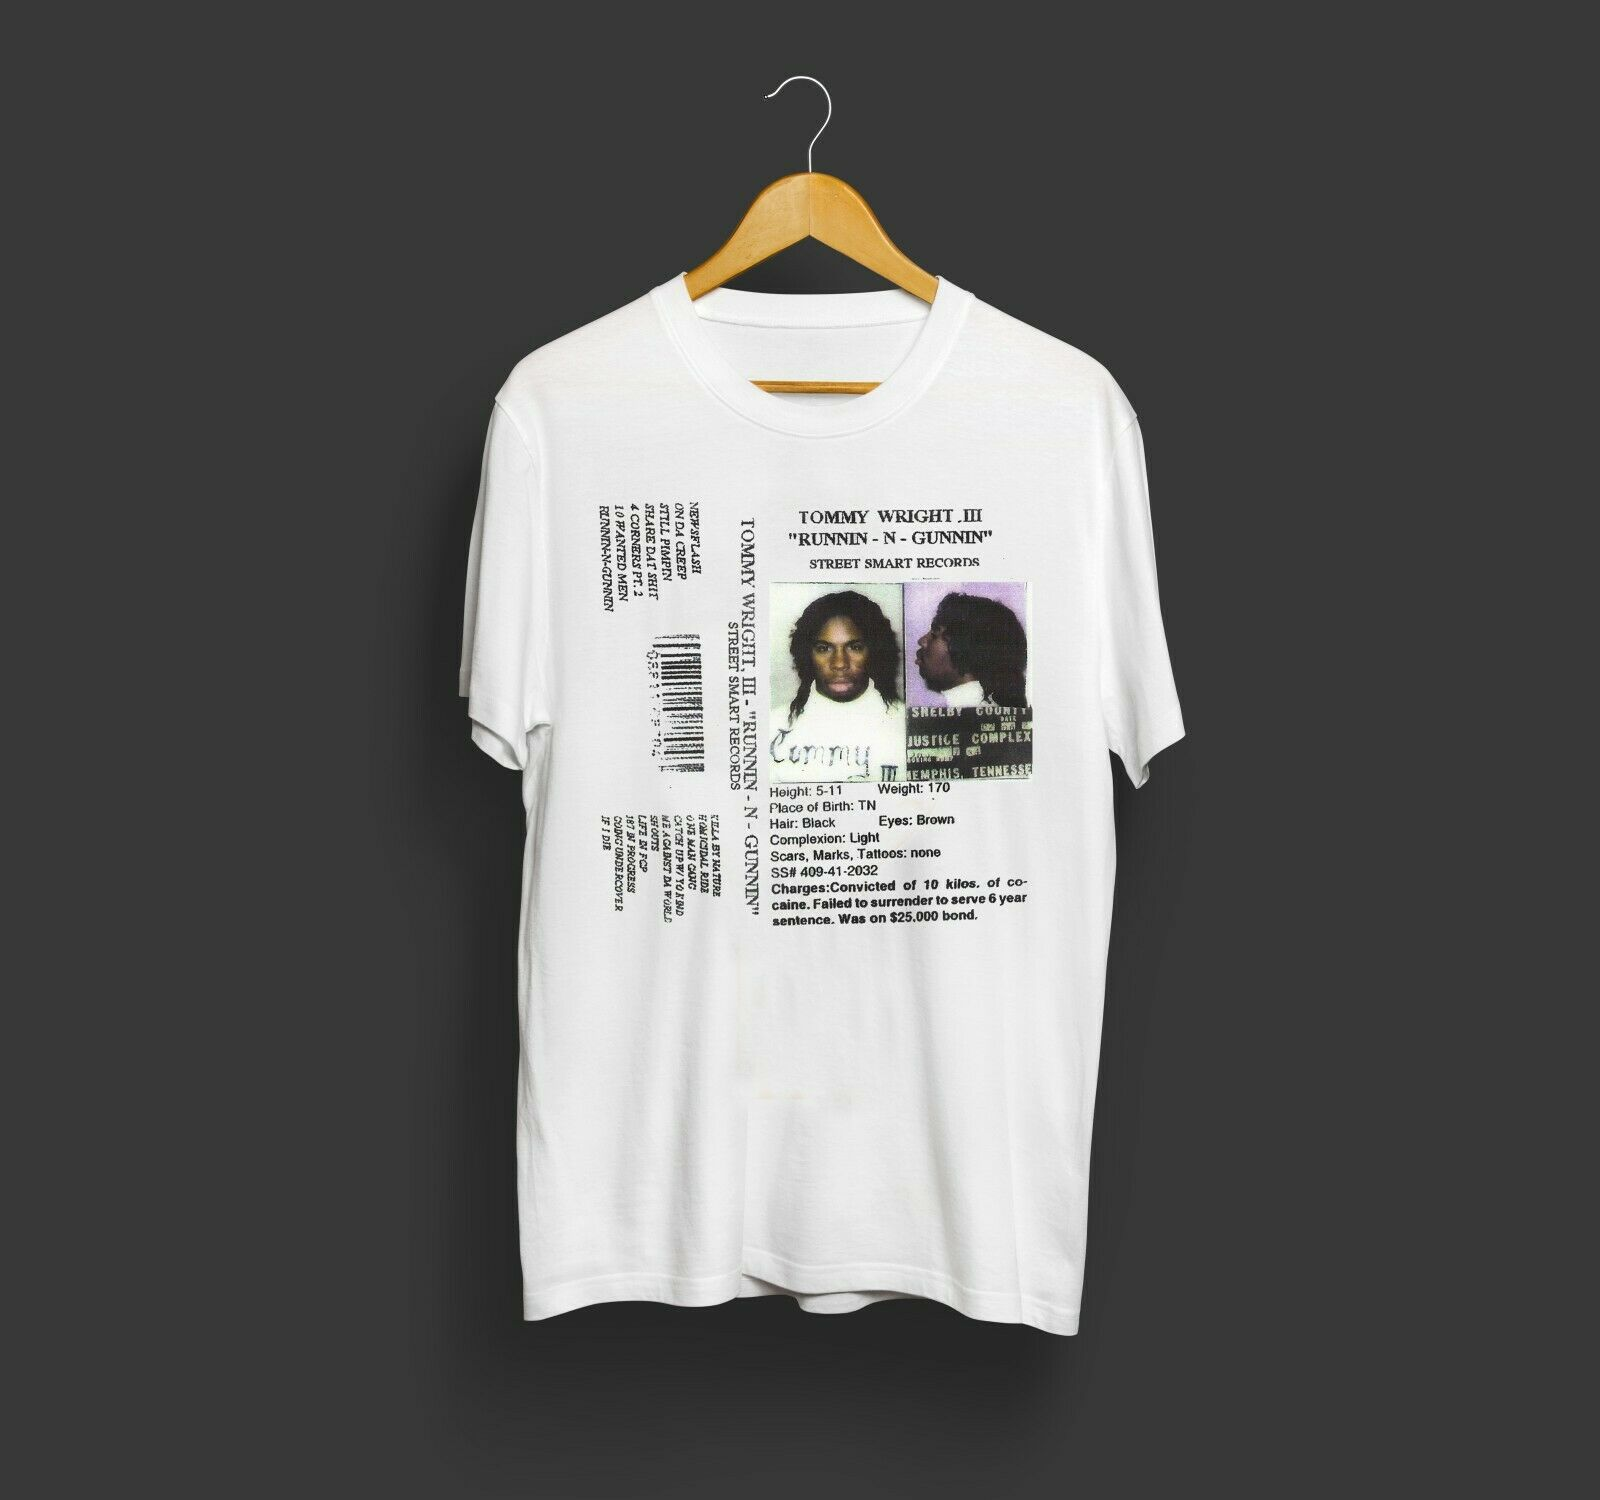 Retro Tommy Wright Iii - Runnin N Gunnin Vintage Tshirt Size S S-3Xl